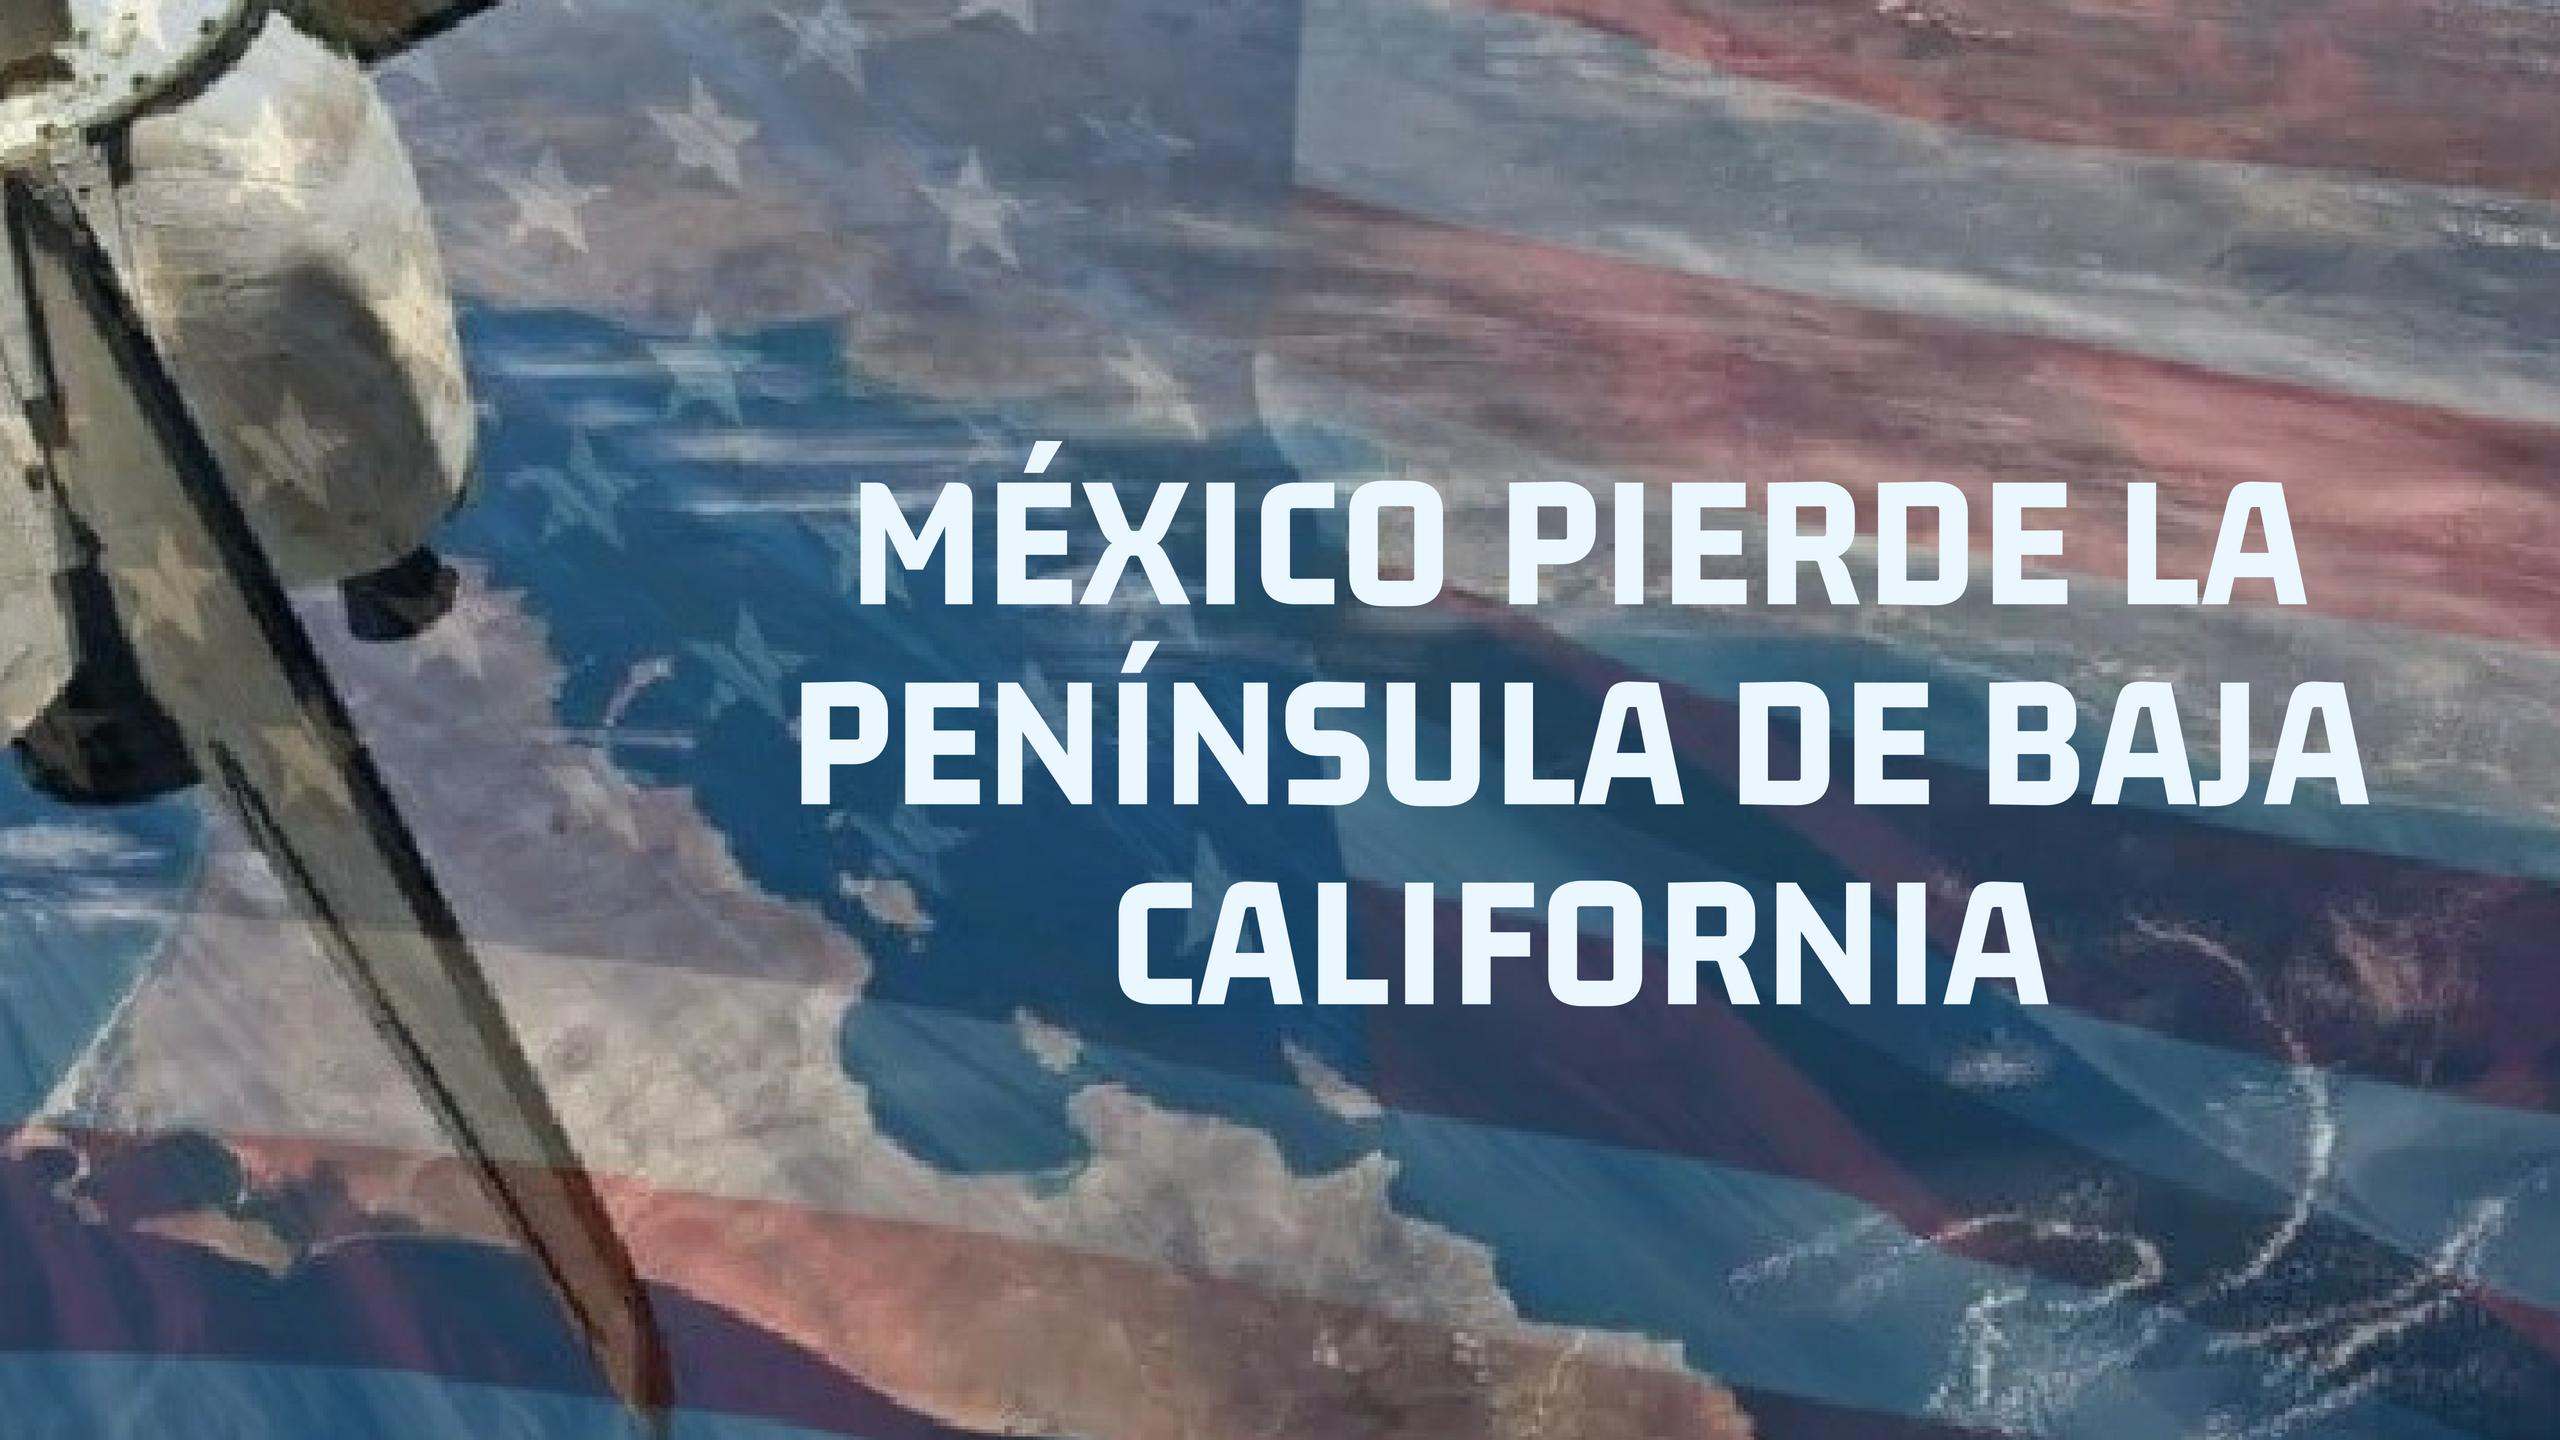 D A A A A A A PENINSULA BAJA CALIFORNIA MEXICO